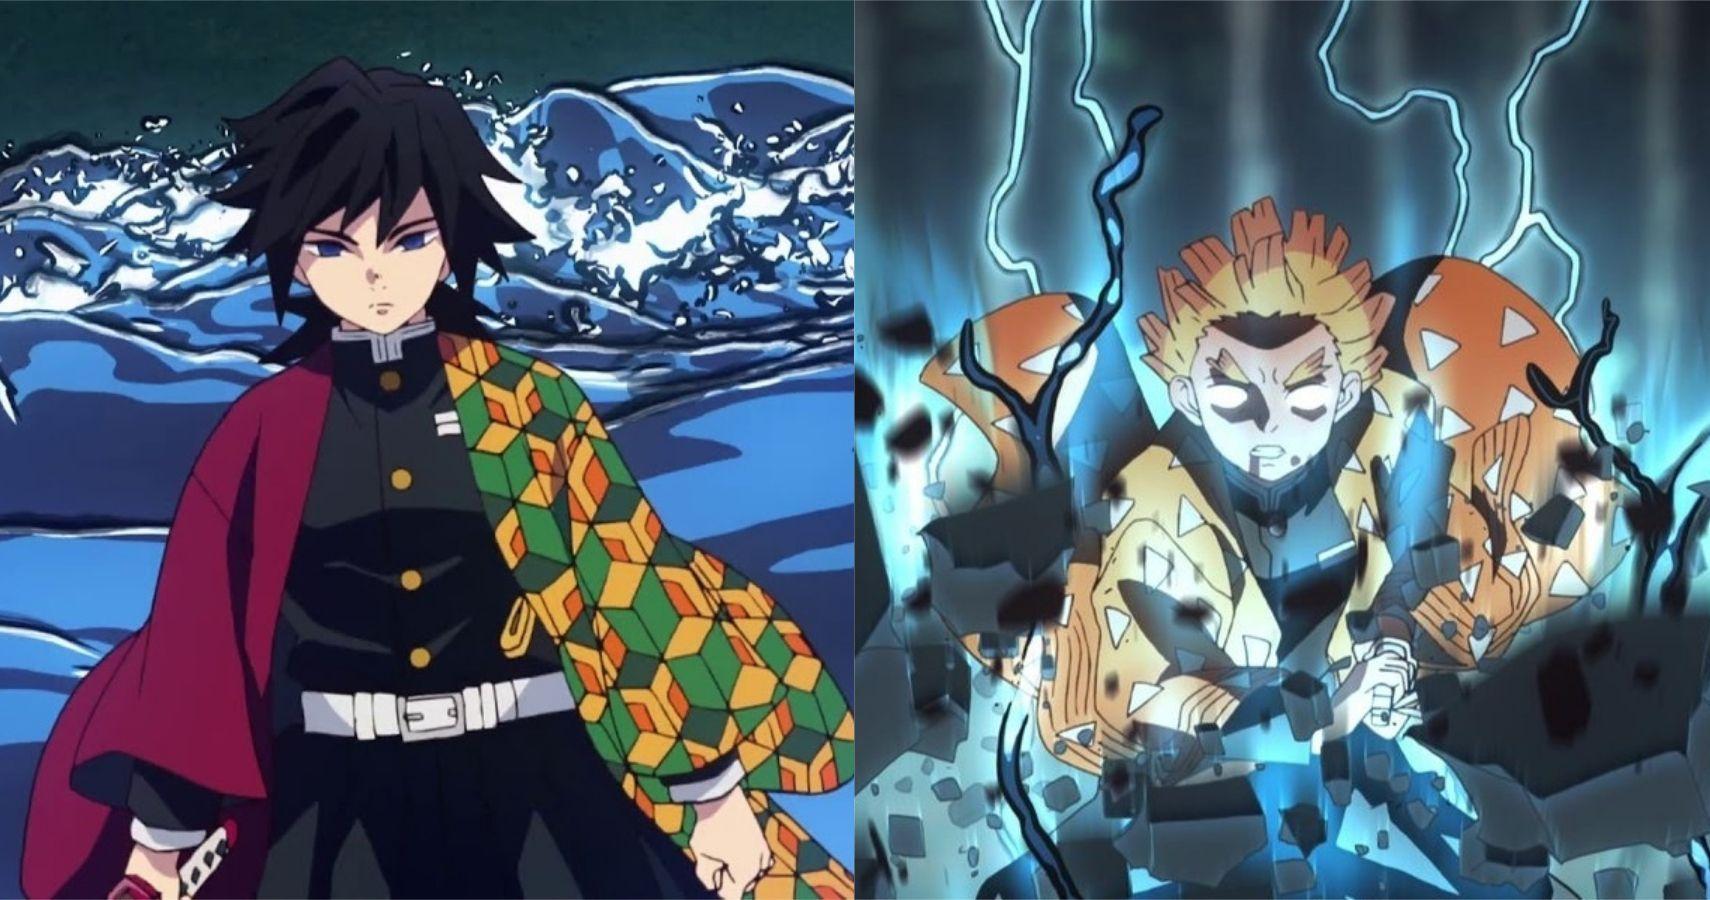 The sound hashira (音柱 おとばしら): Demon Slayer All Dead Characters - Manga